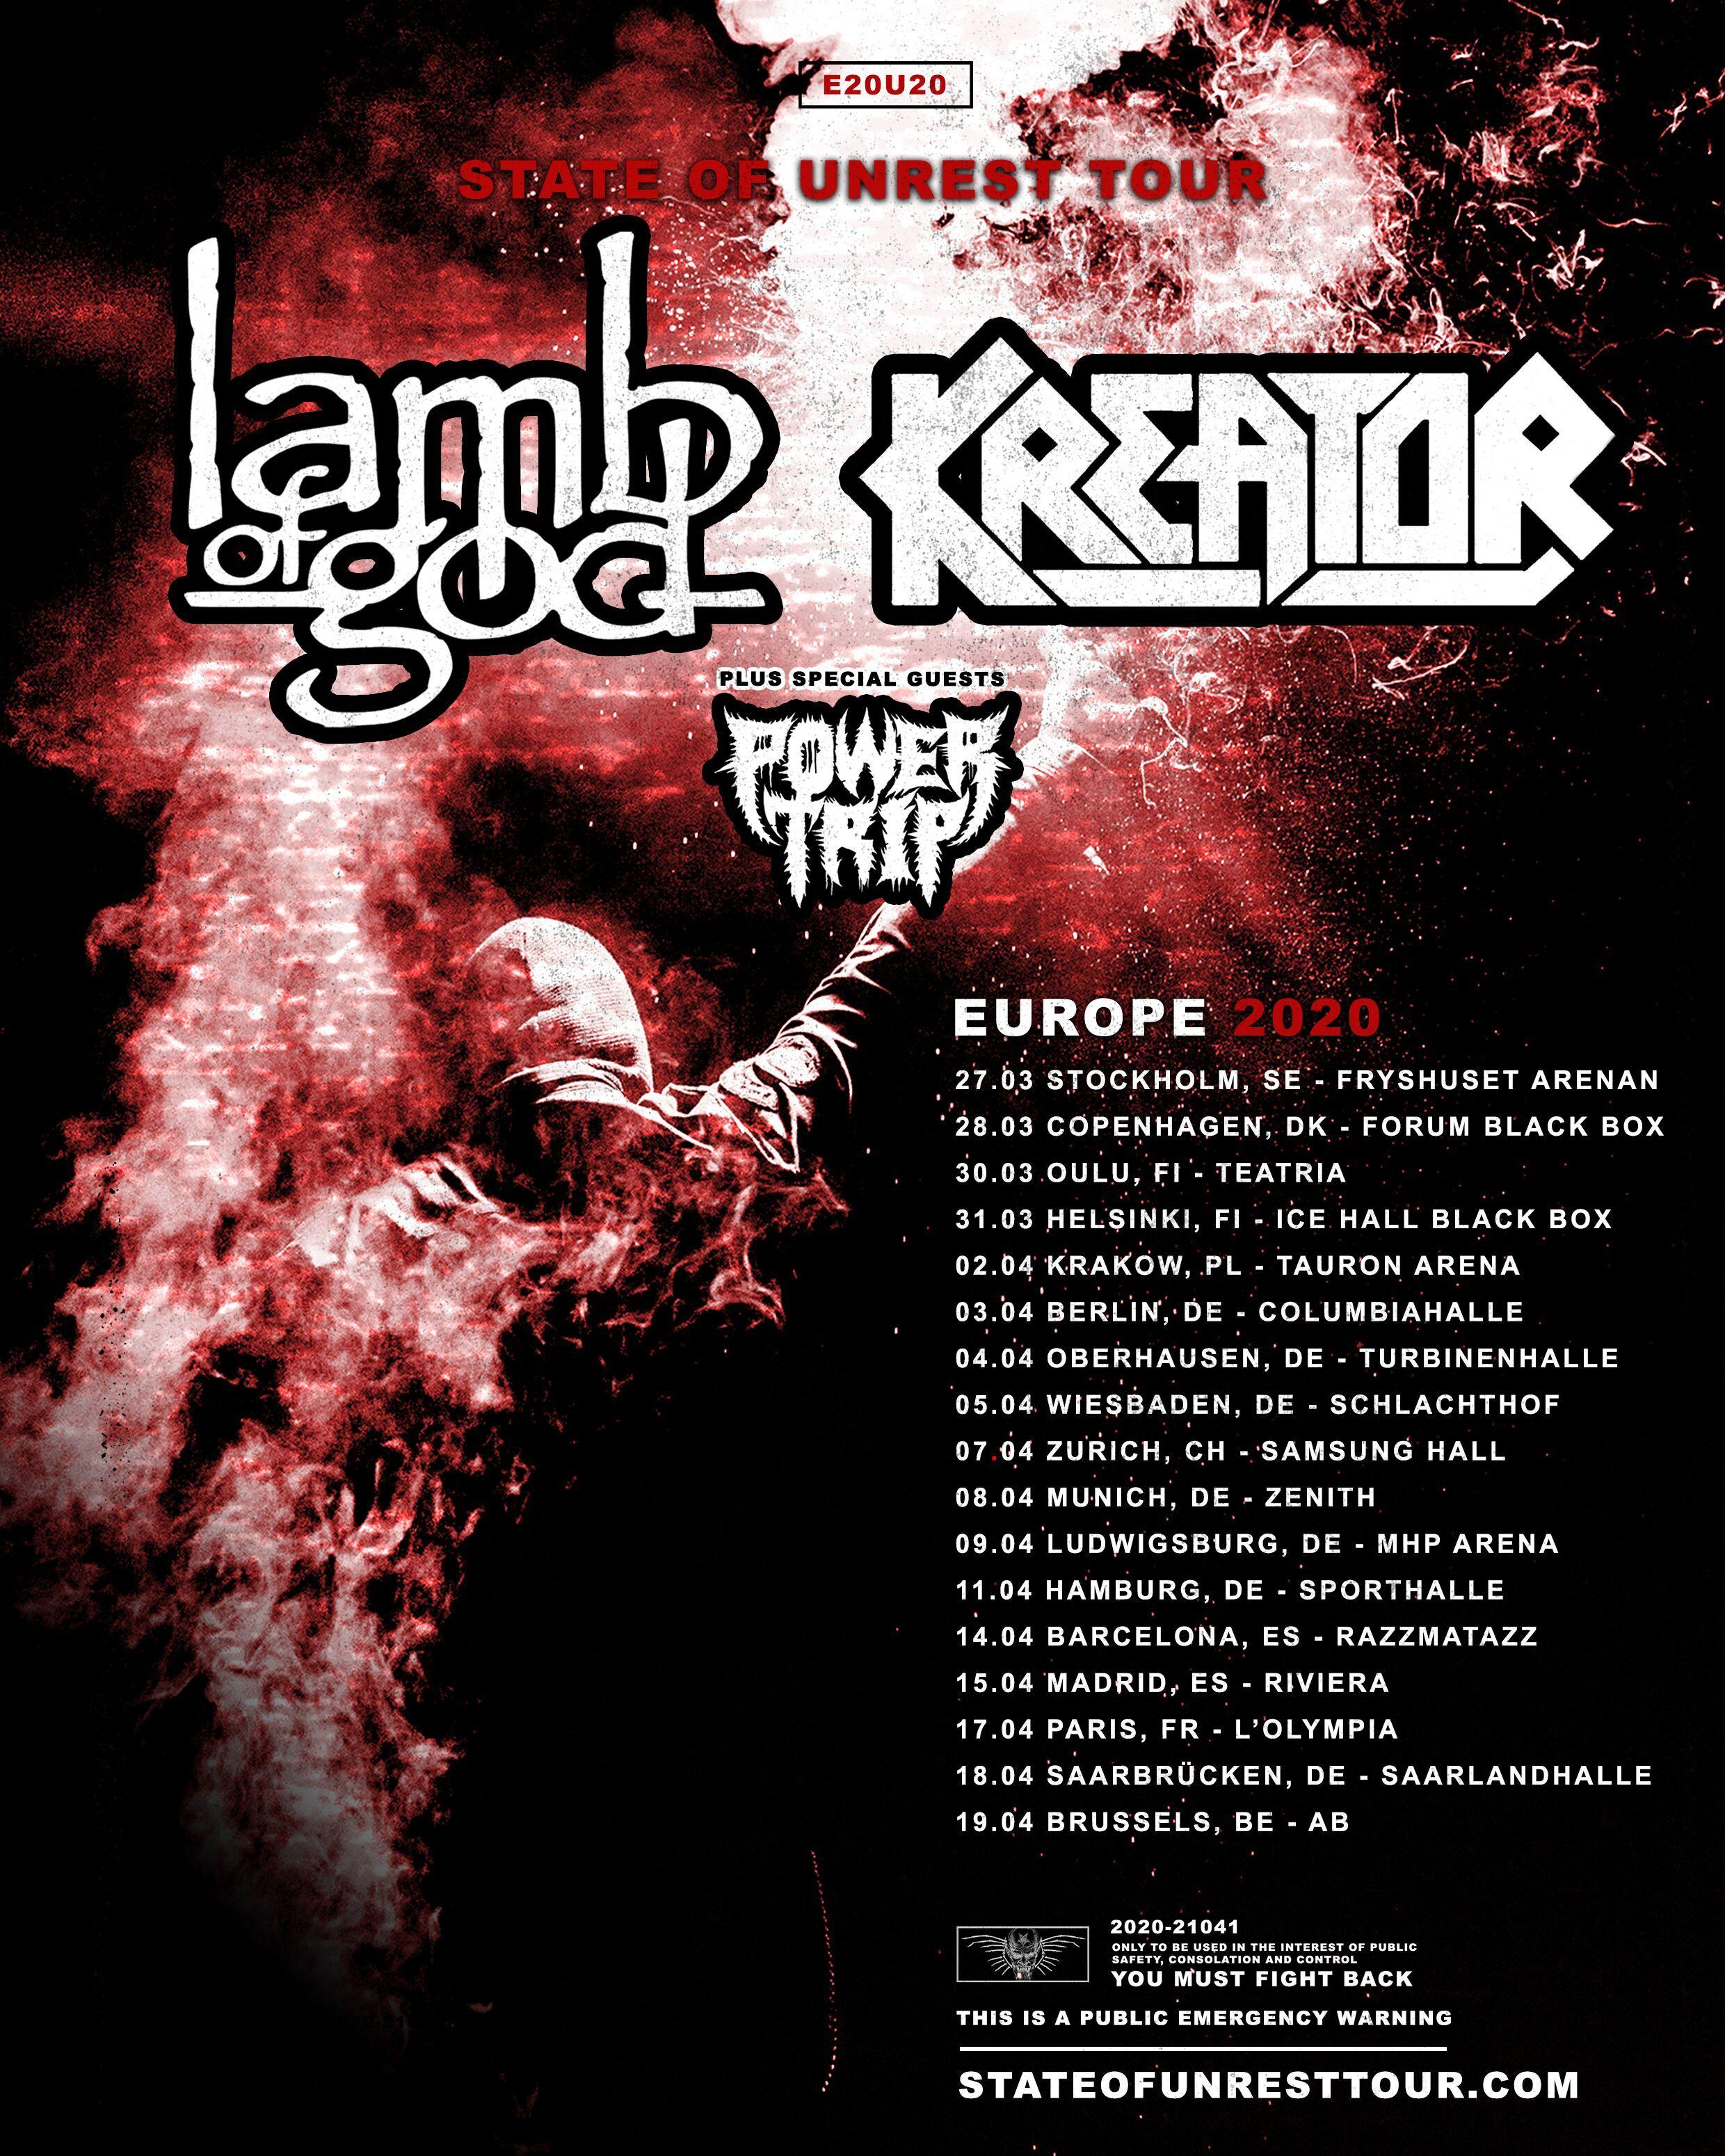 Lamb Of God & Kreator - Tour 2020